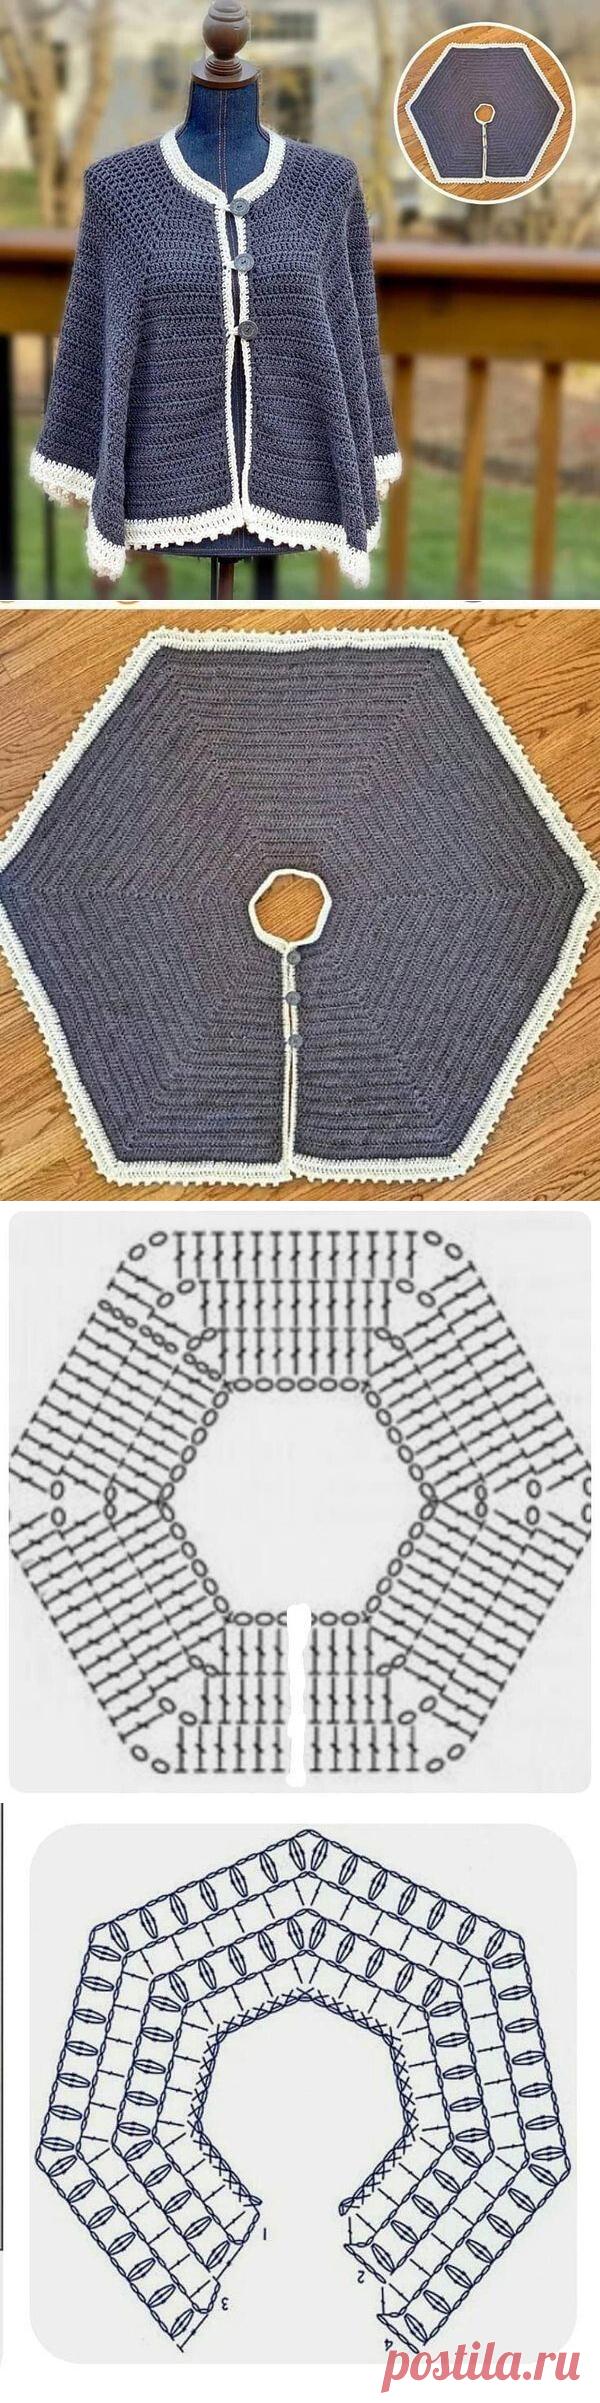 Плотная шаль-накидка, связанная крючком